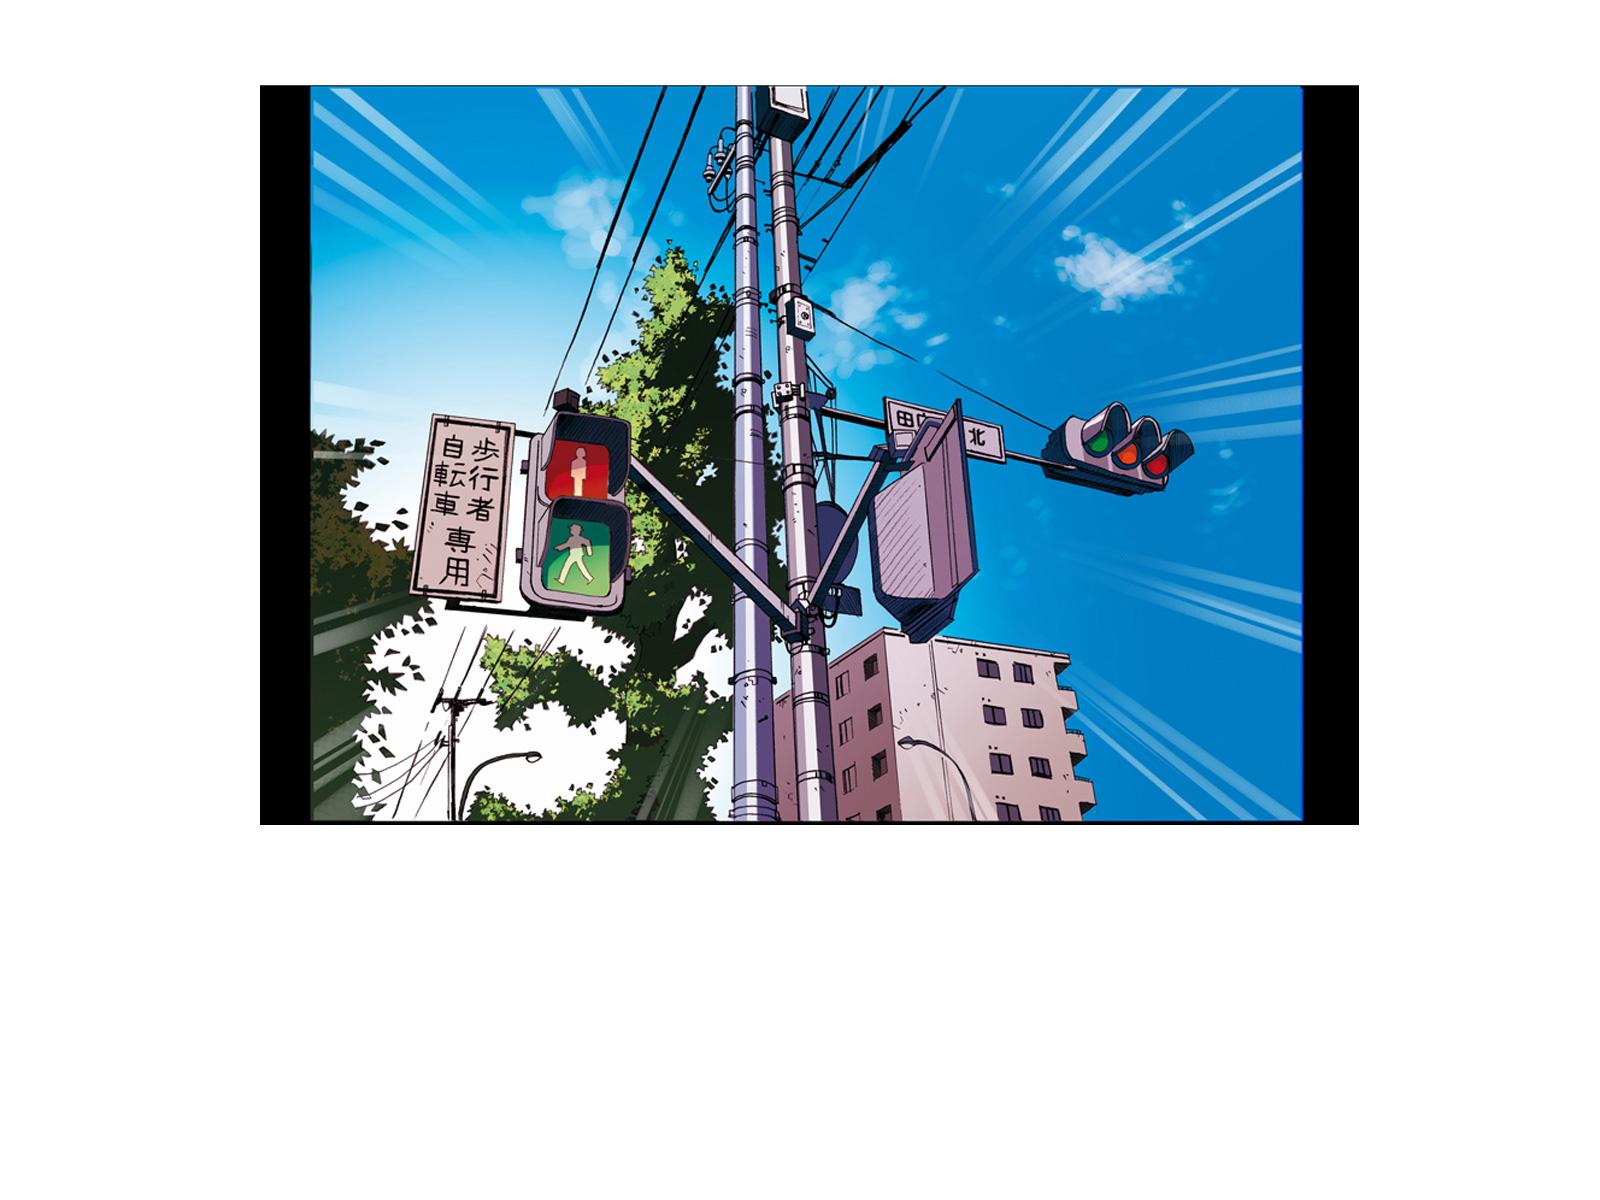 RECIOAlfonso-Illustrations-1030